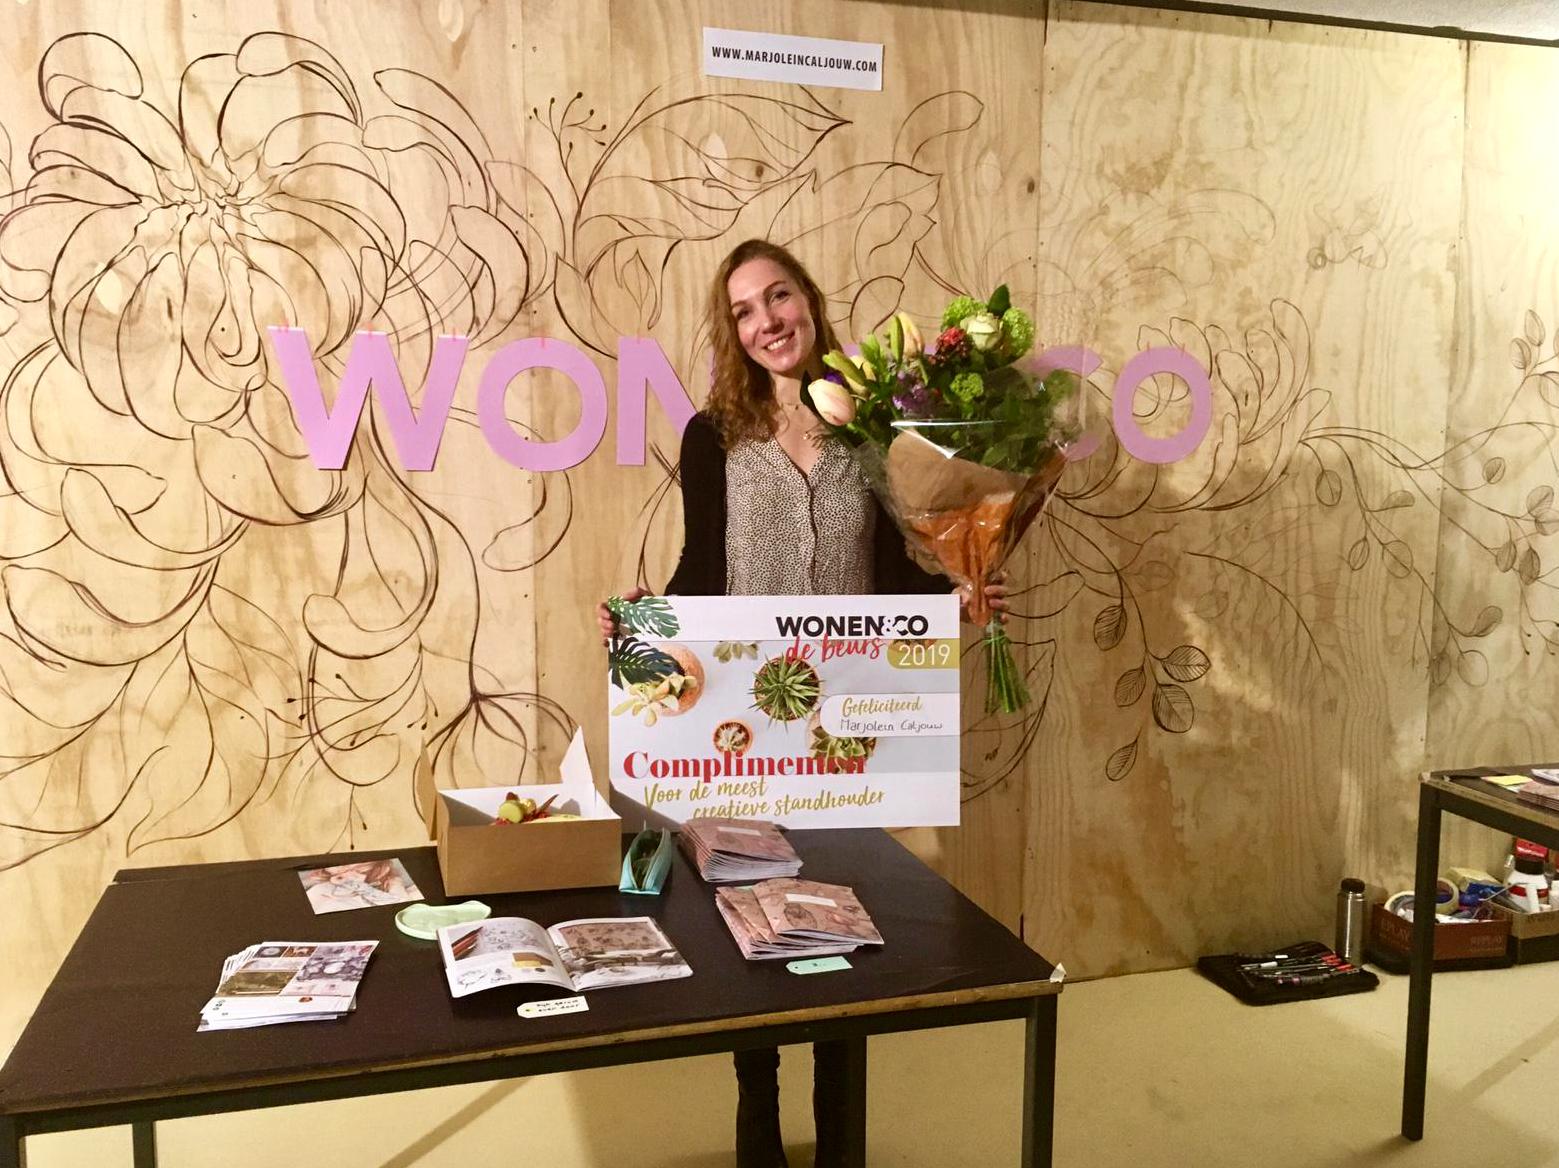 Wonenencodebeurs_2019_MarjoleinCaljouw.jpg